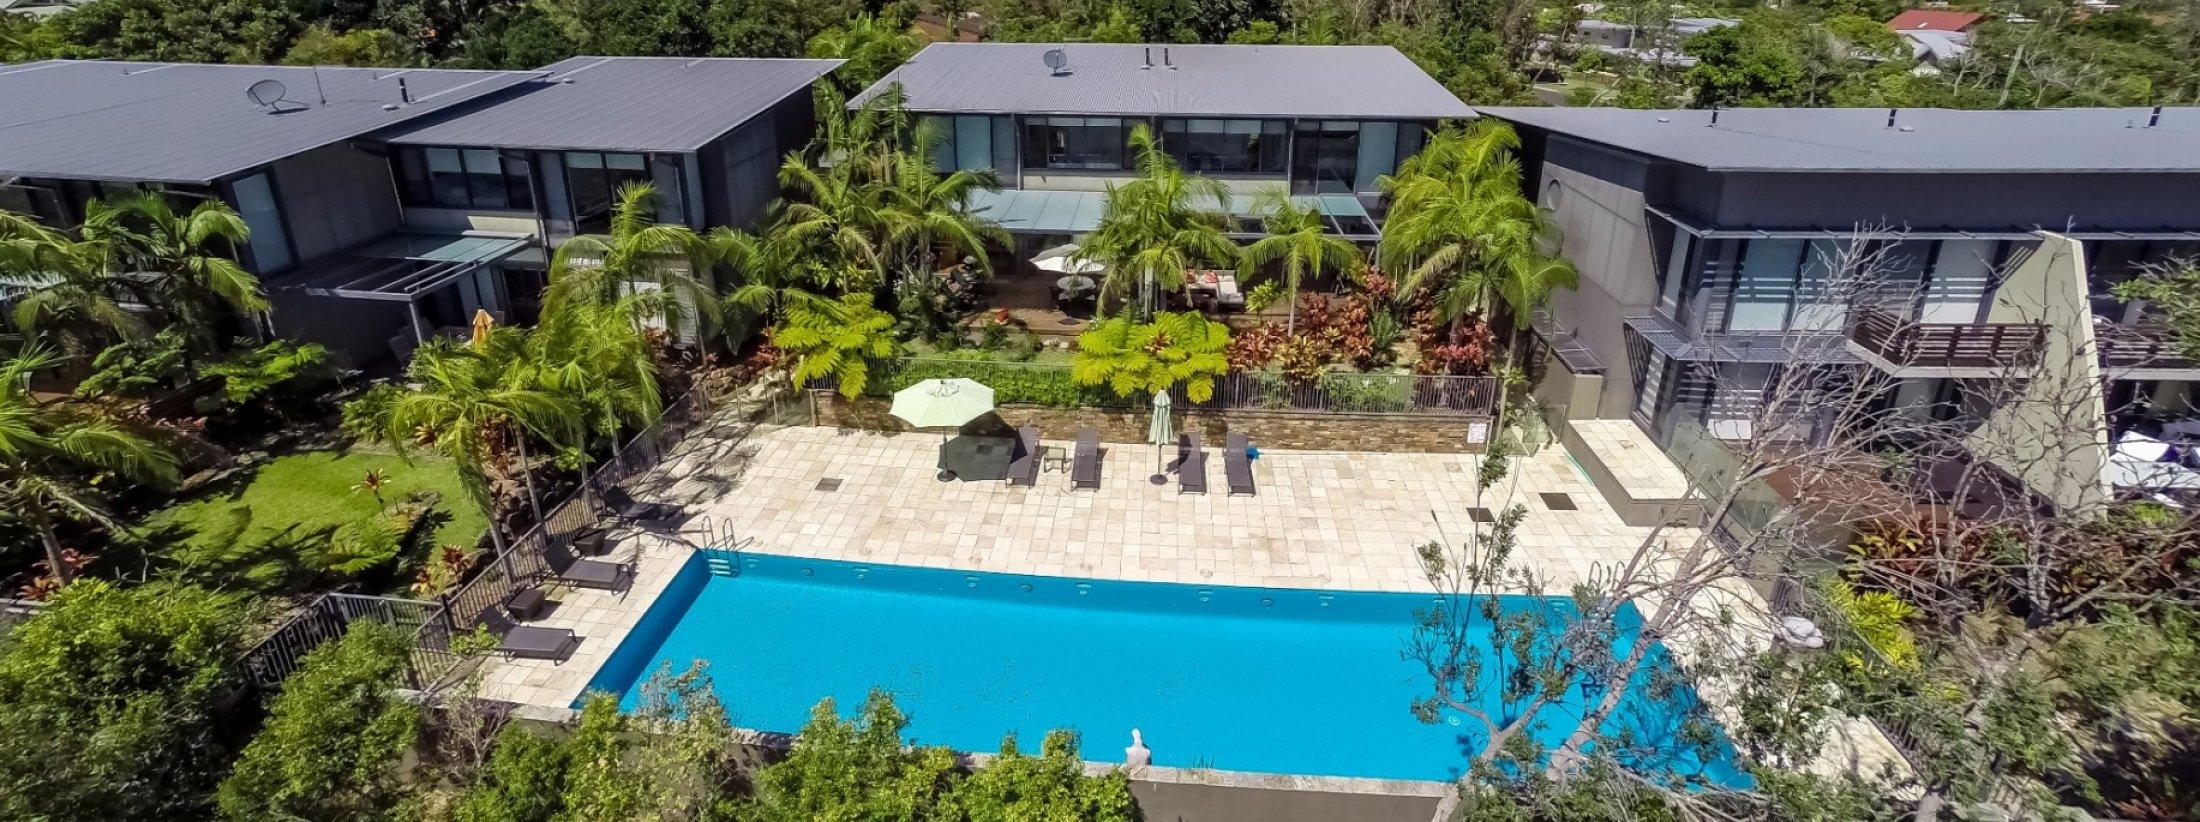 Kiah Beachside - Belongil Beach - Byron Bay - Aerial View